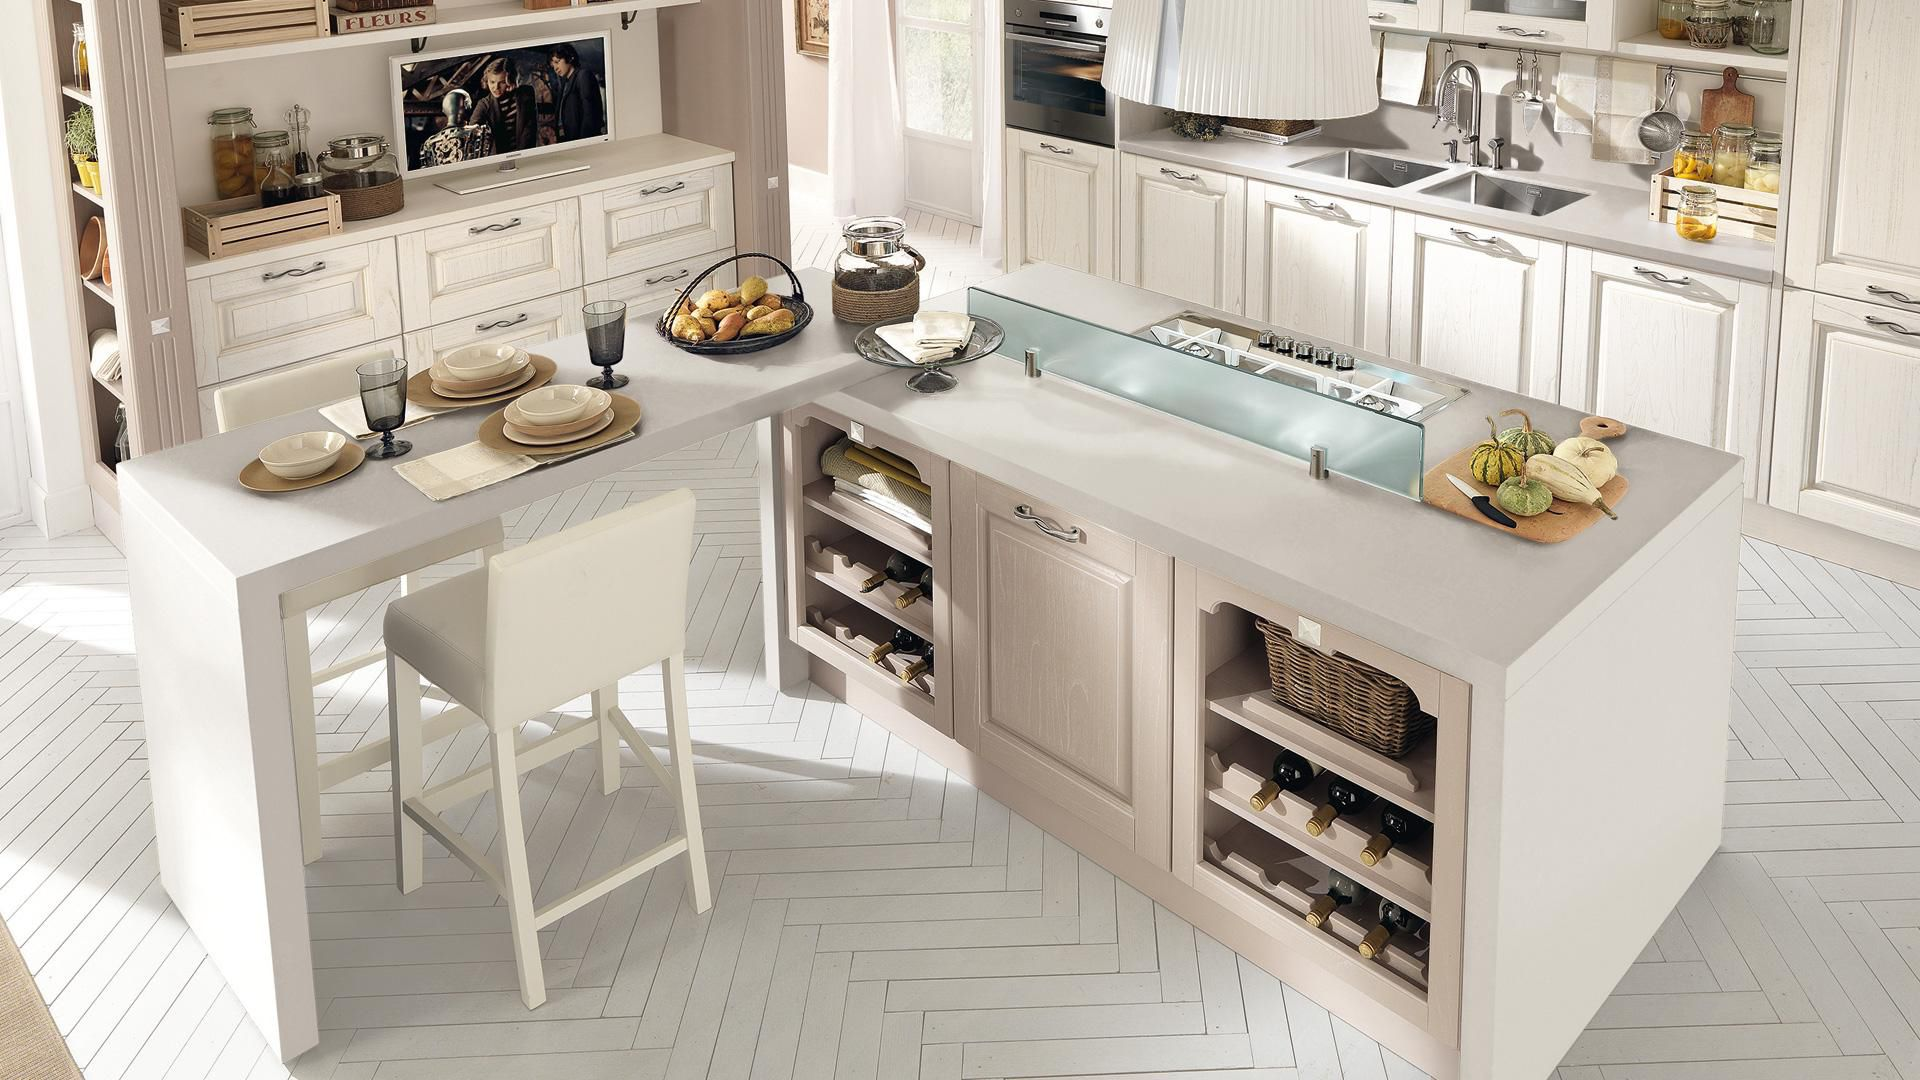 Traditional kitchen / wooden / island - LAURA - CUCINE LUBE - Videos